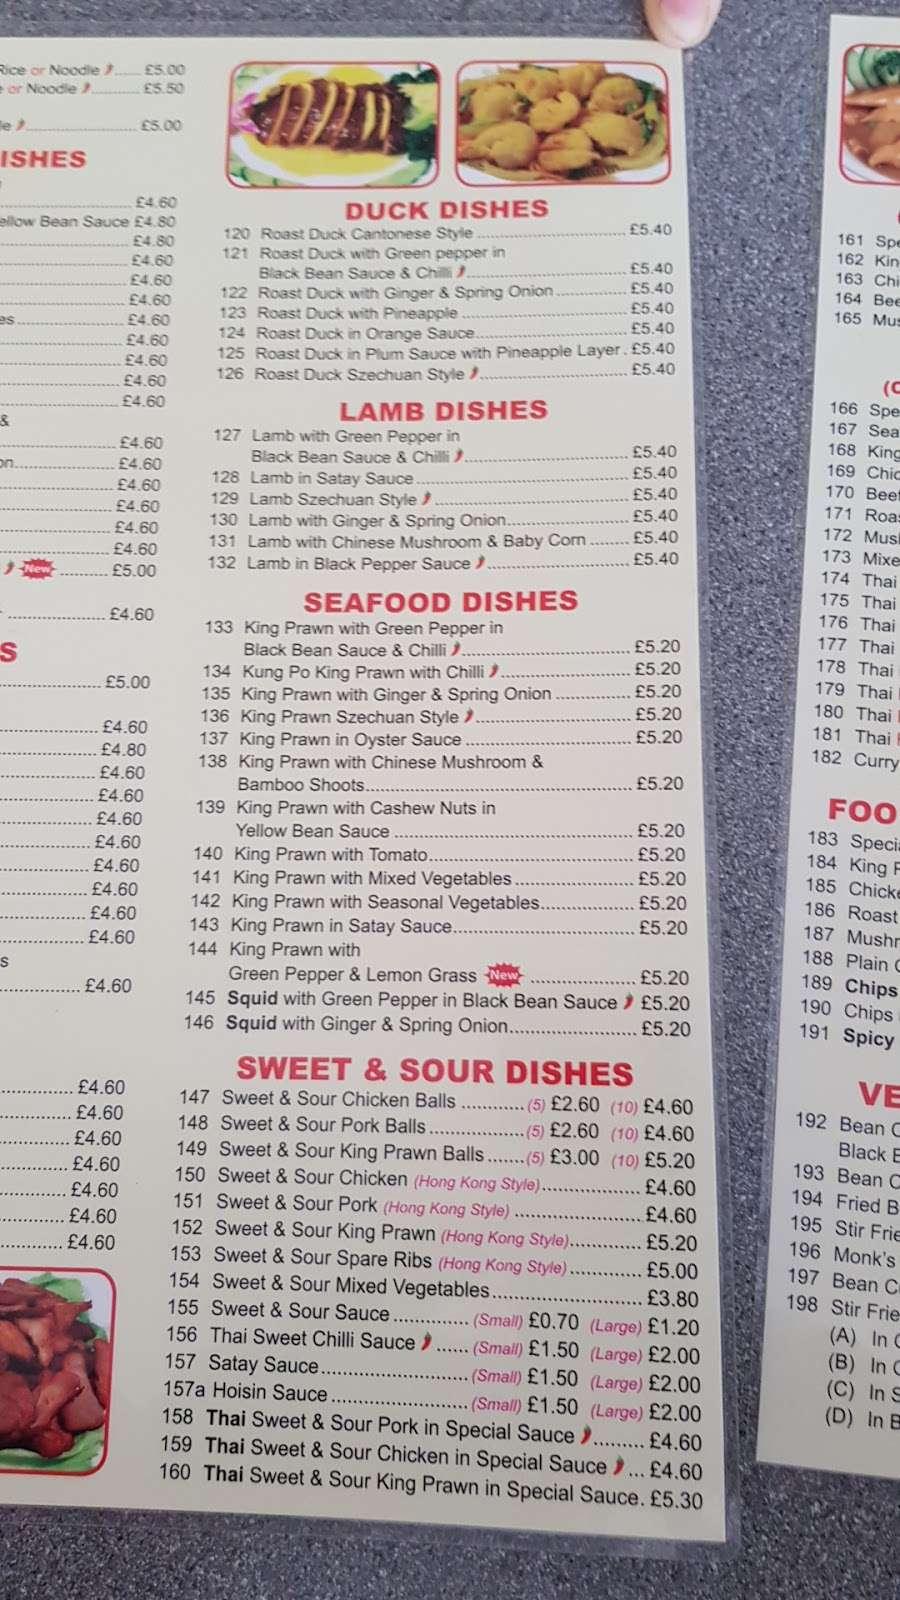 Wing Hing - meal takeaway  | Photo 7 of 7 | Address: 109 Whetstone Rd, London SE3 8QA, UK | Phone: 020 8856 9370